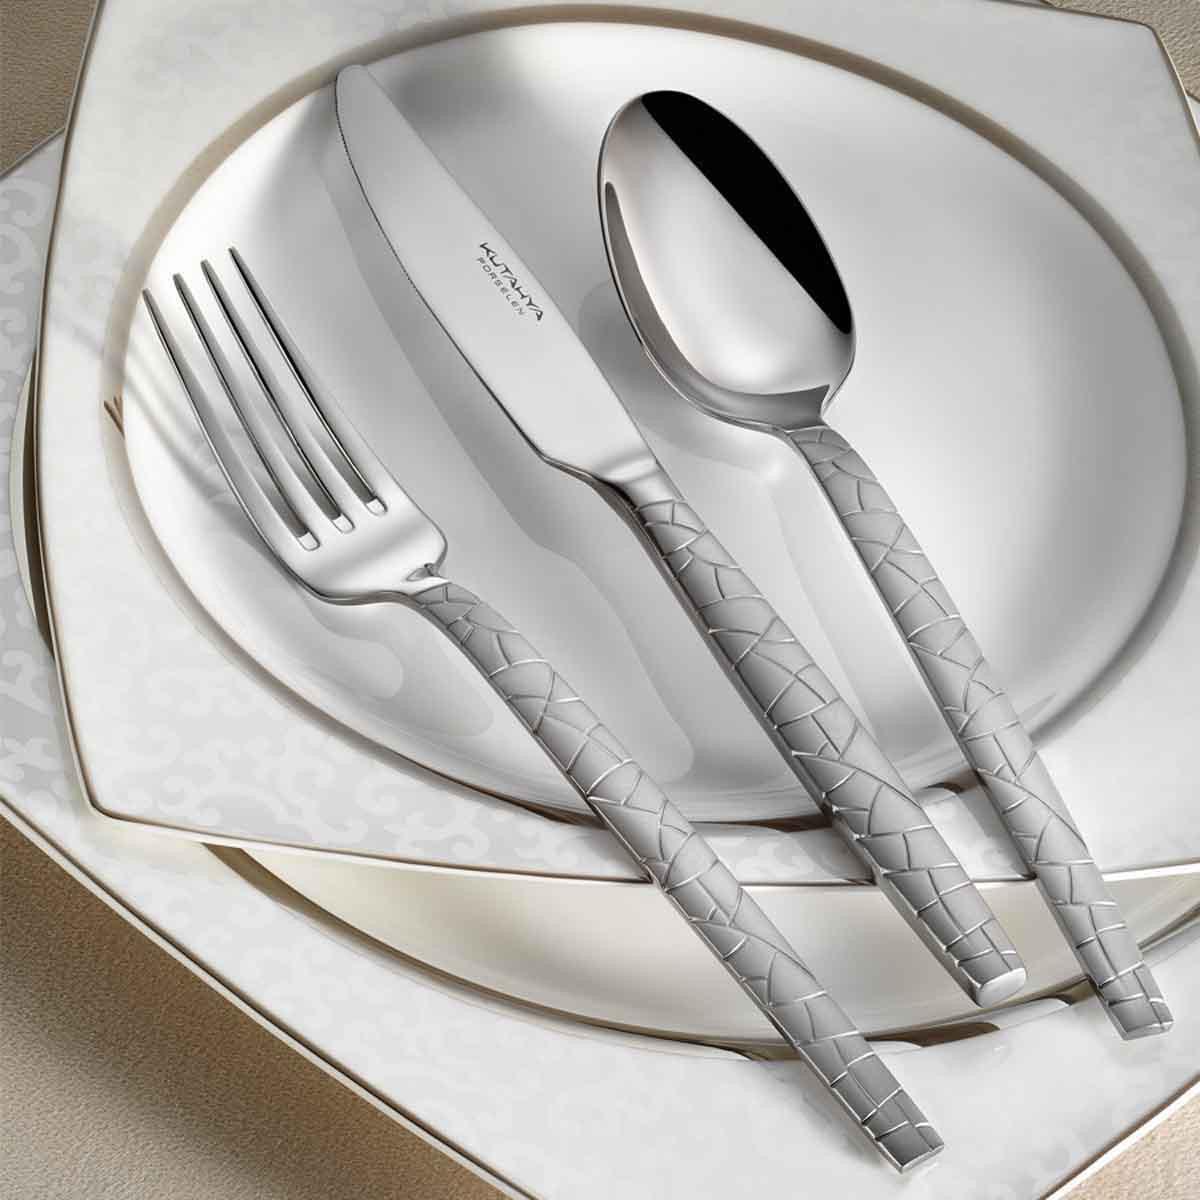 Kutahya Porselen M1 89 Pieces Flatware Sets